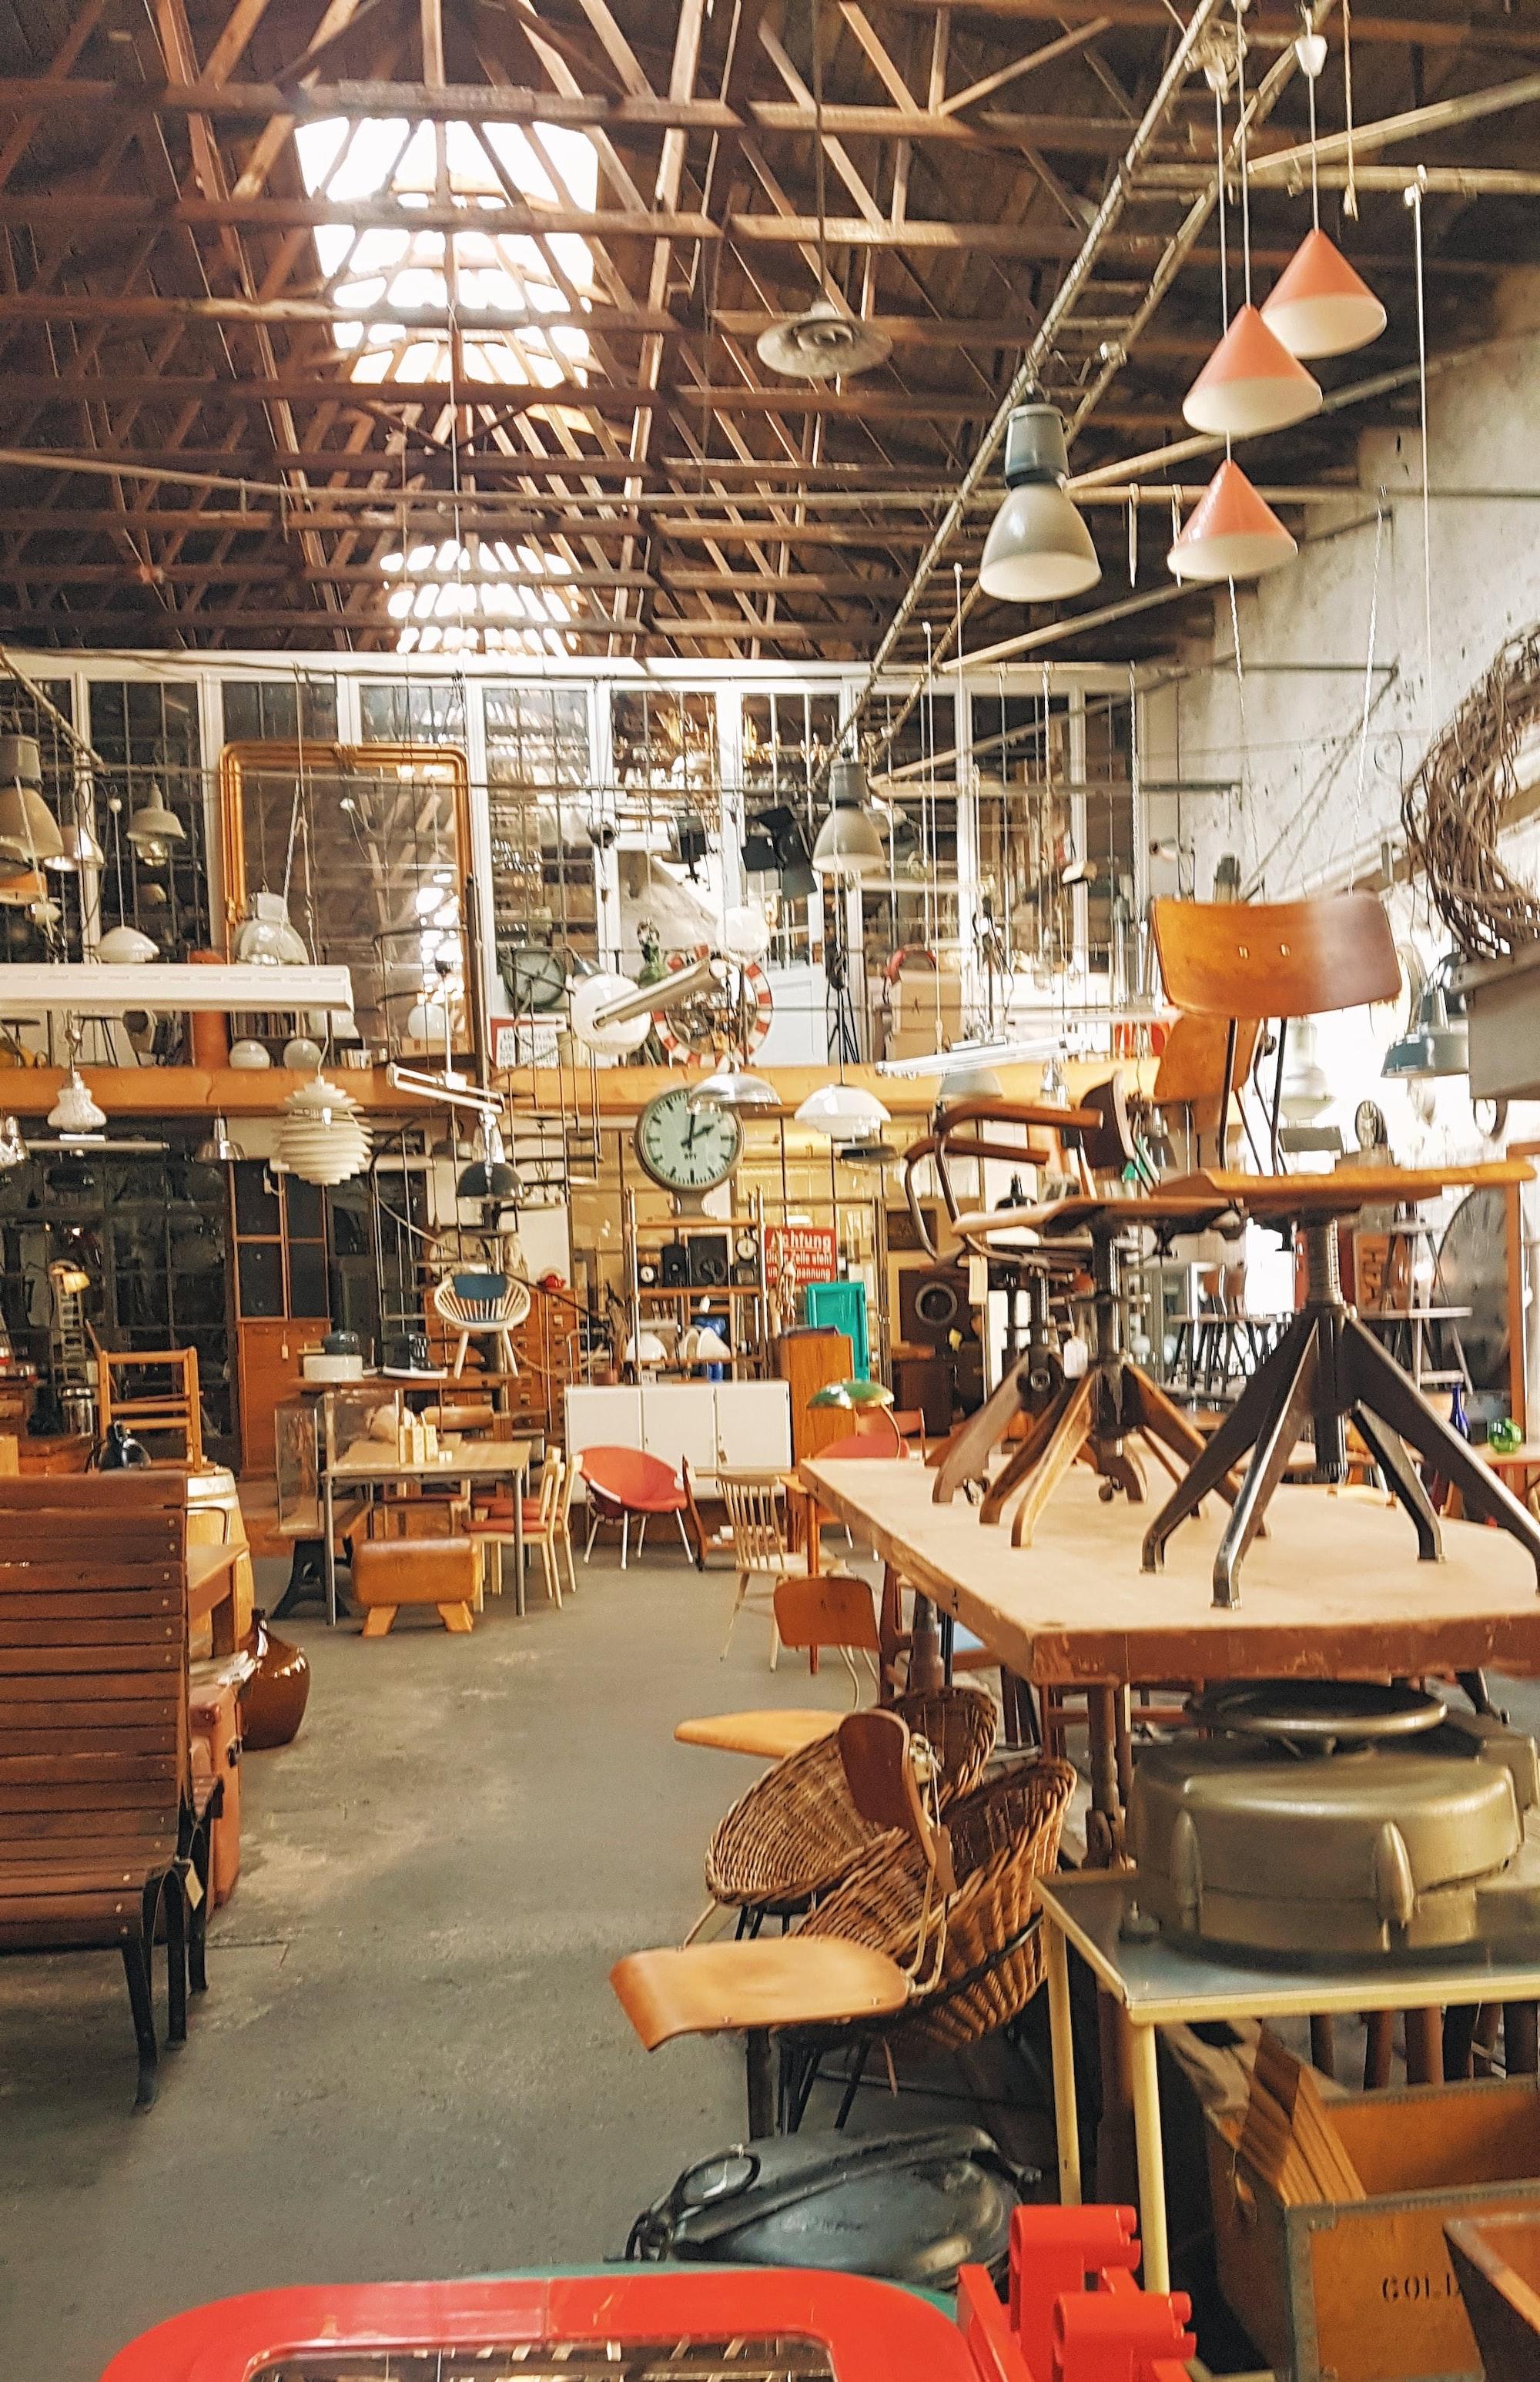 Flea Market in Leipzig, Germany. For more visual travel inspiration visit our instagram: https://www.instagram.com/reiseuhu